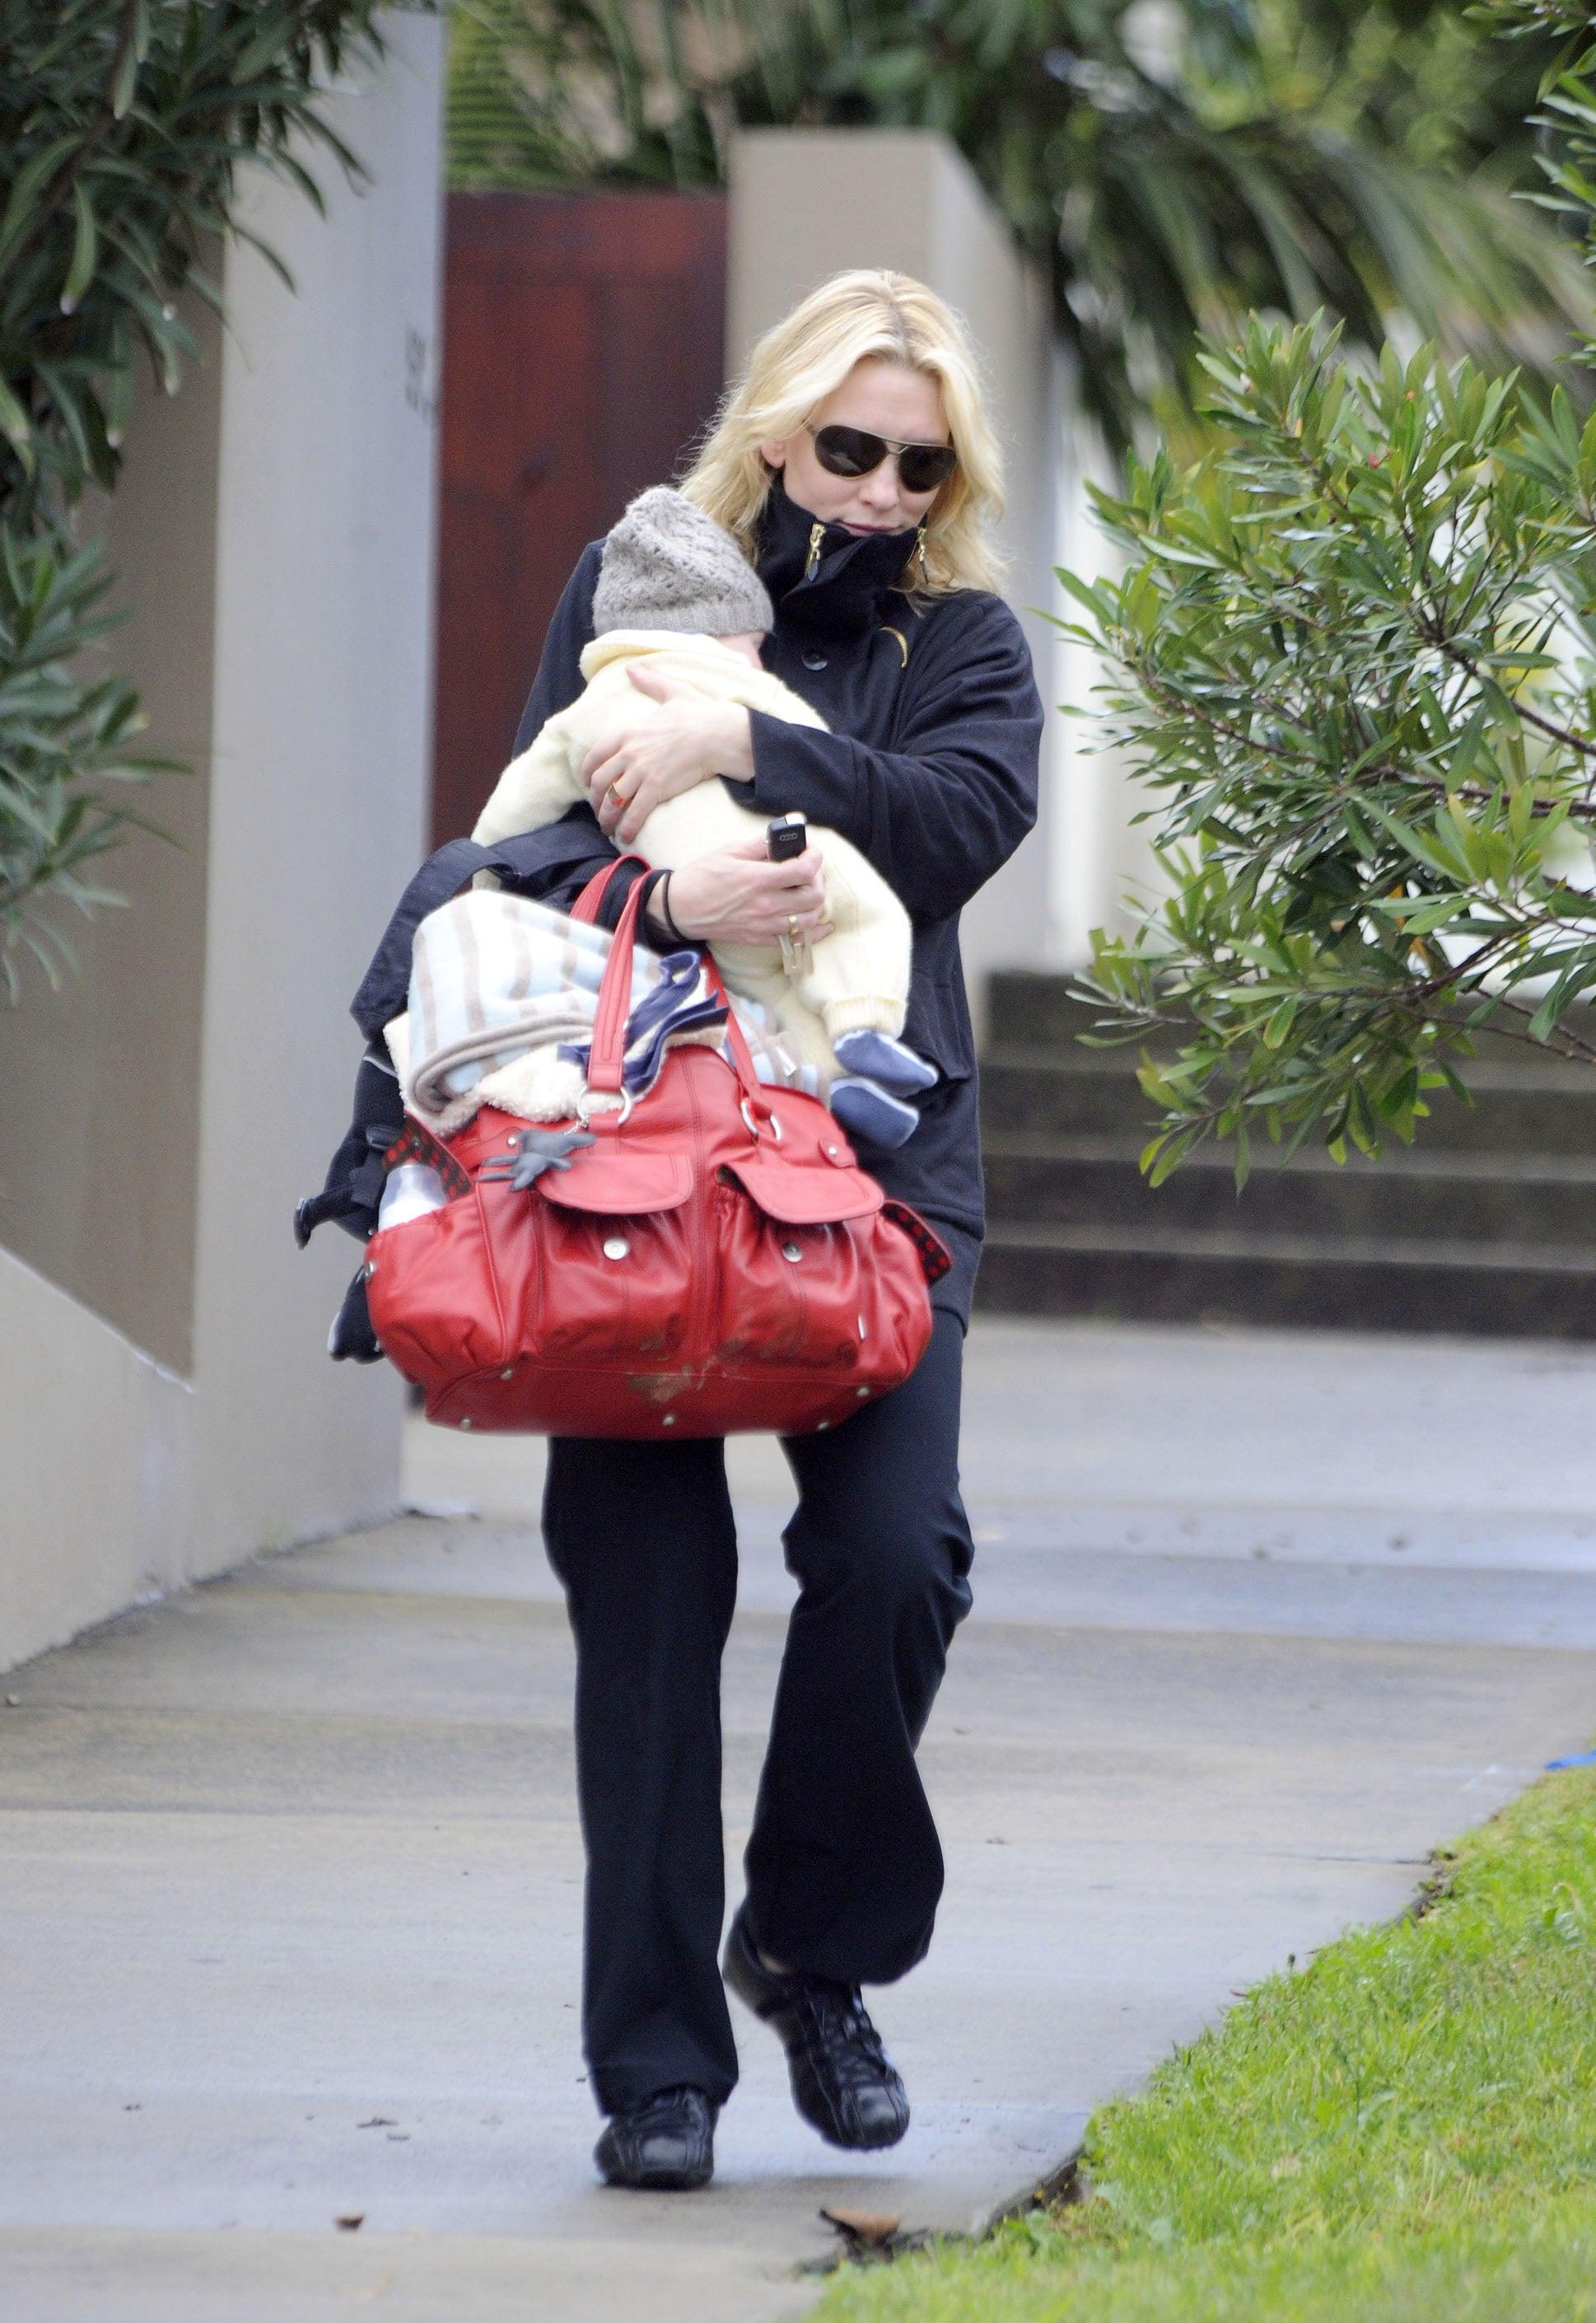 Cate Blanchett and Son Ignatius Take a Stroll